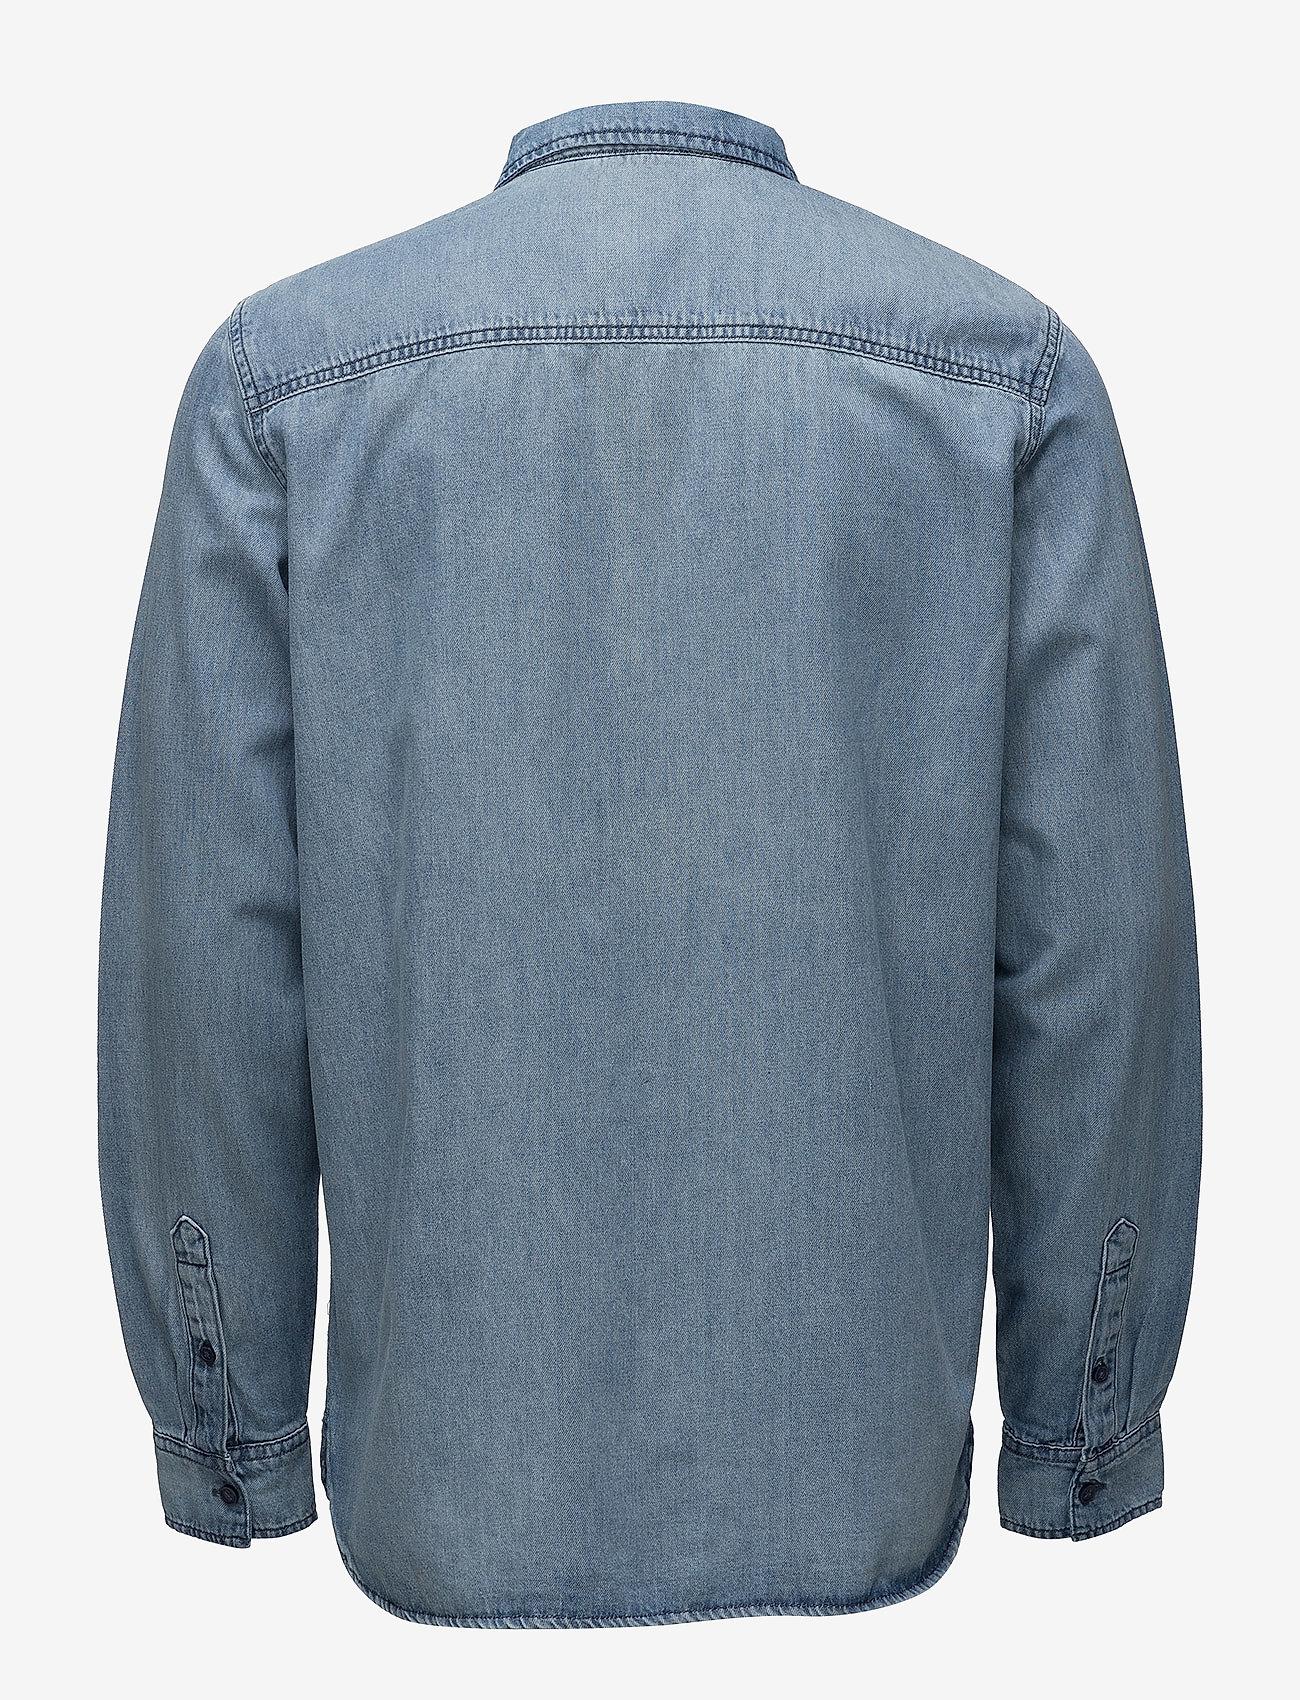 Cheap Monday Give Denim Shirt - Shirts